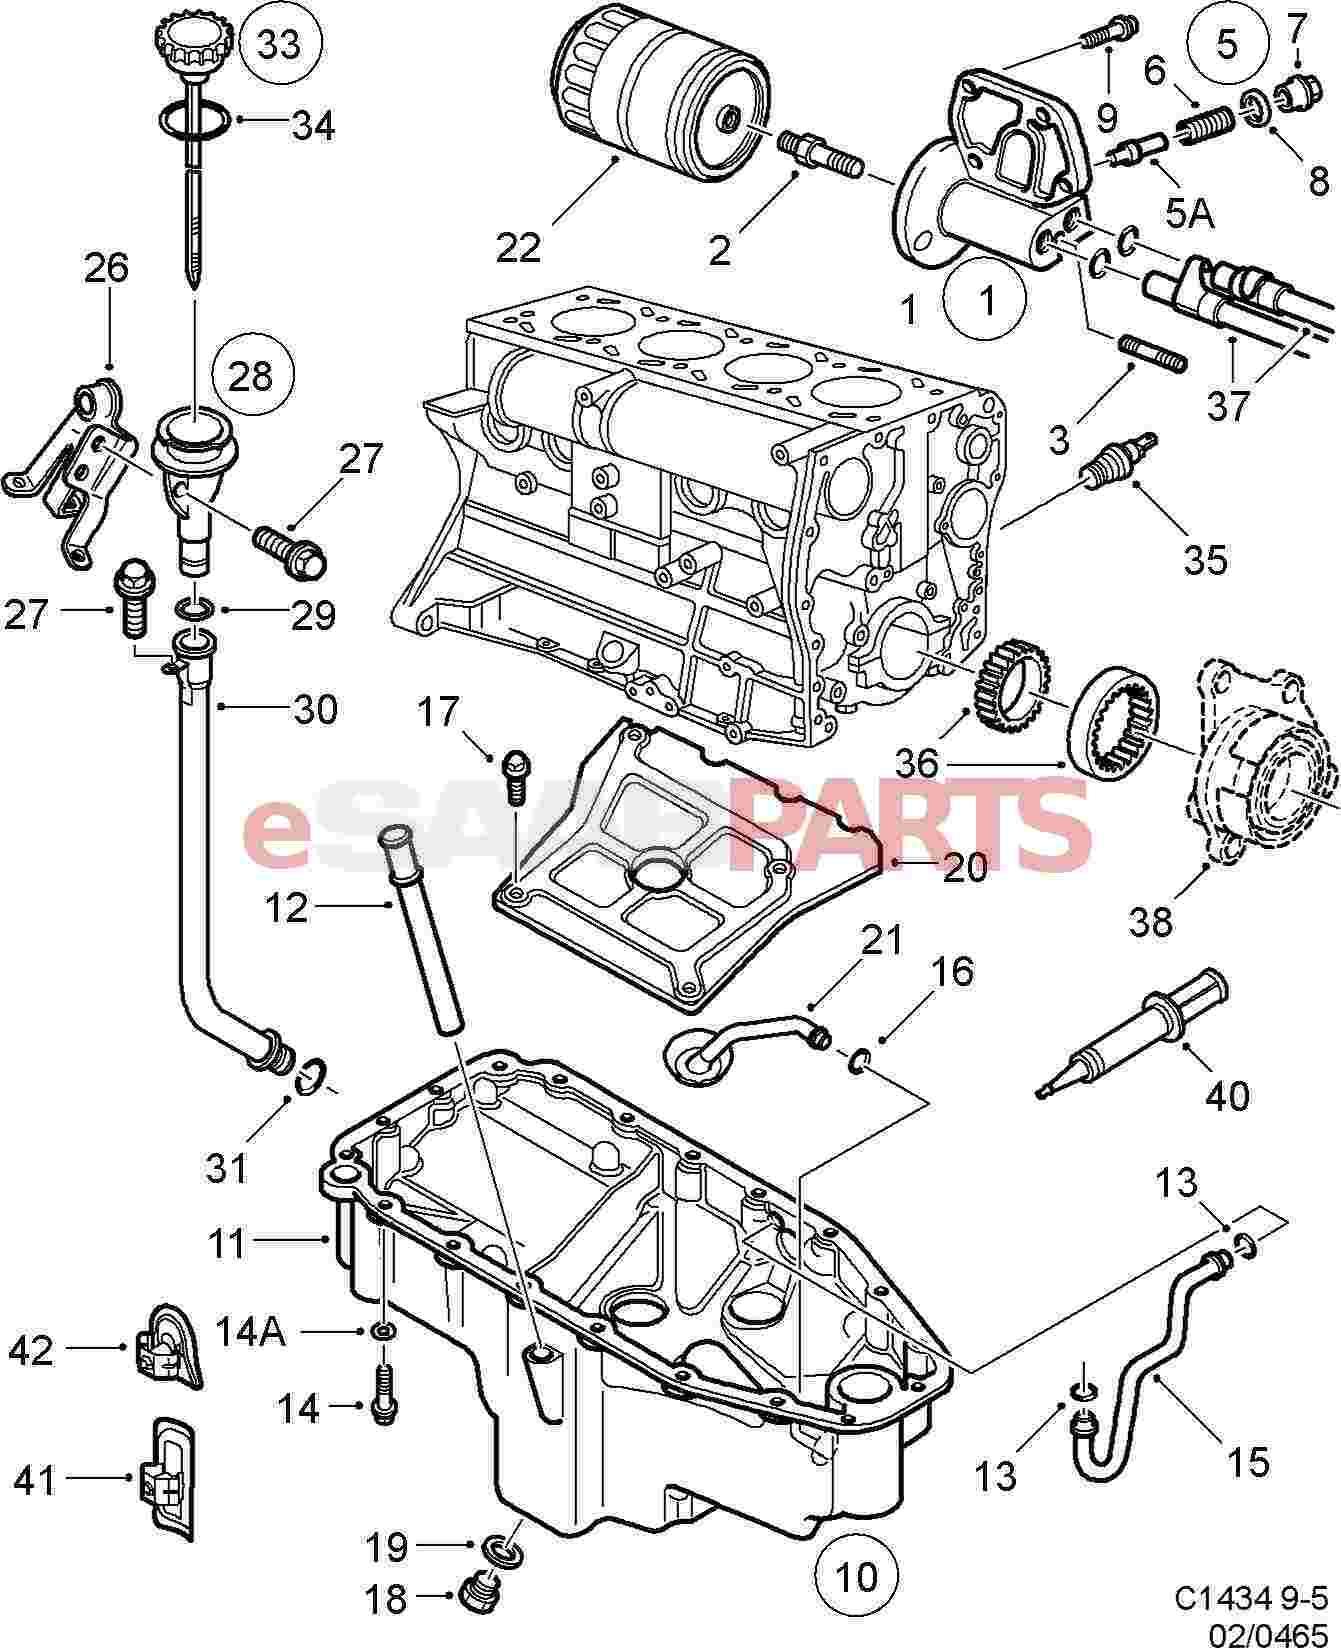 hight resolution of saab 2000 9 5 engine diagram oil wiring diagrams value saab 9 5 engine parts